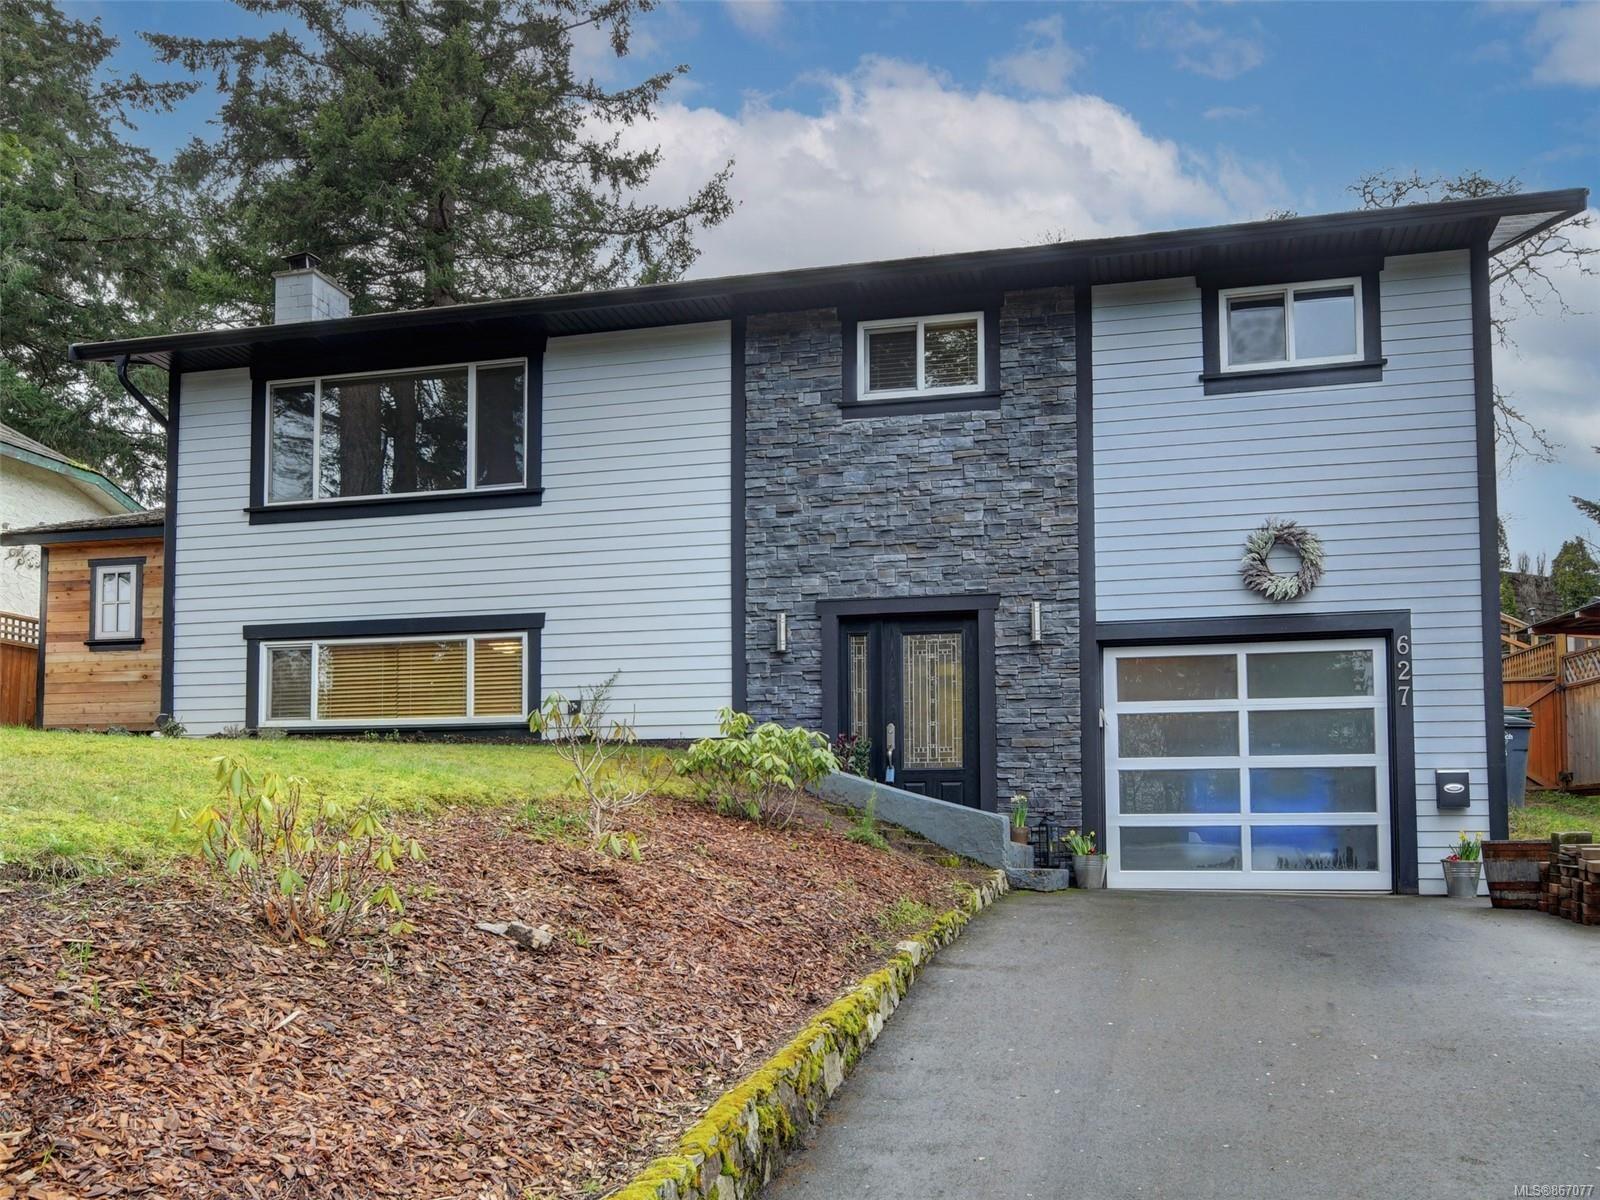 Main Photo: 627 Vanalman Ave in : SW Northridge House for sale (Saanich West)  : MLS®# 867077